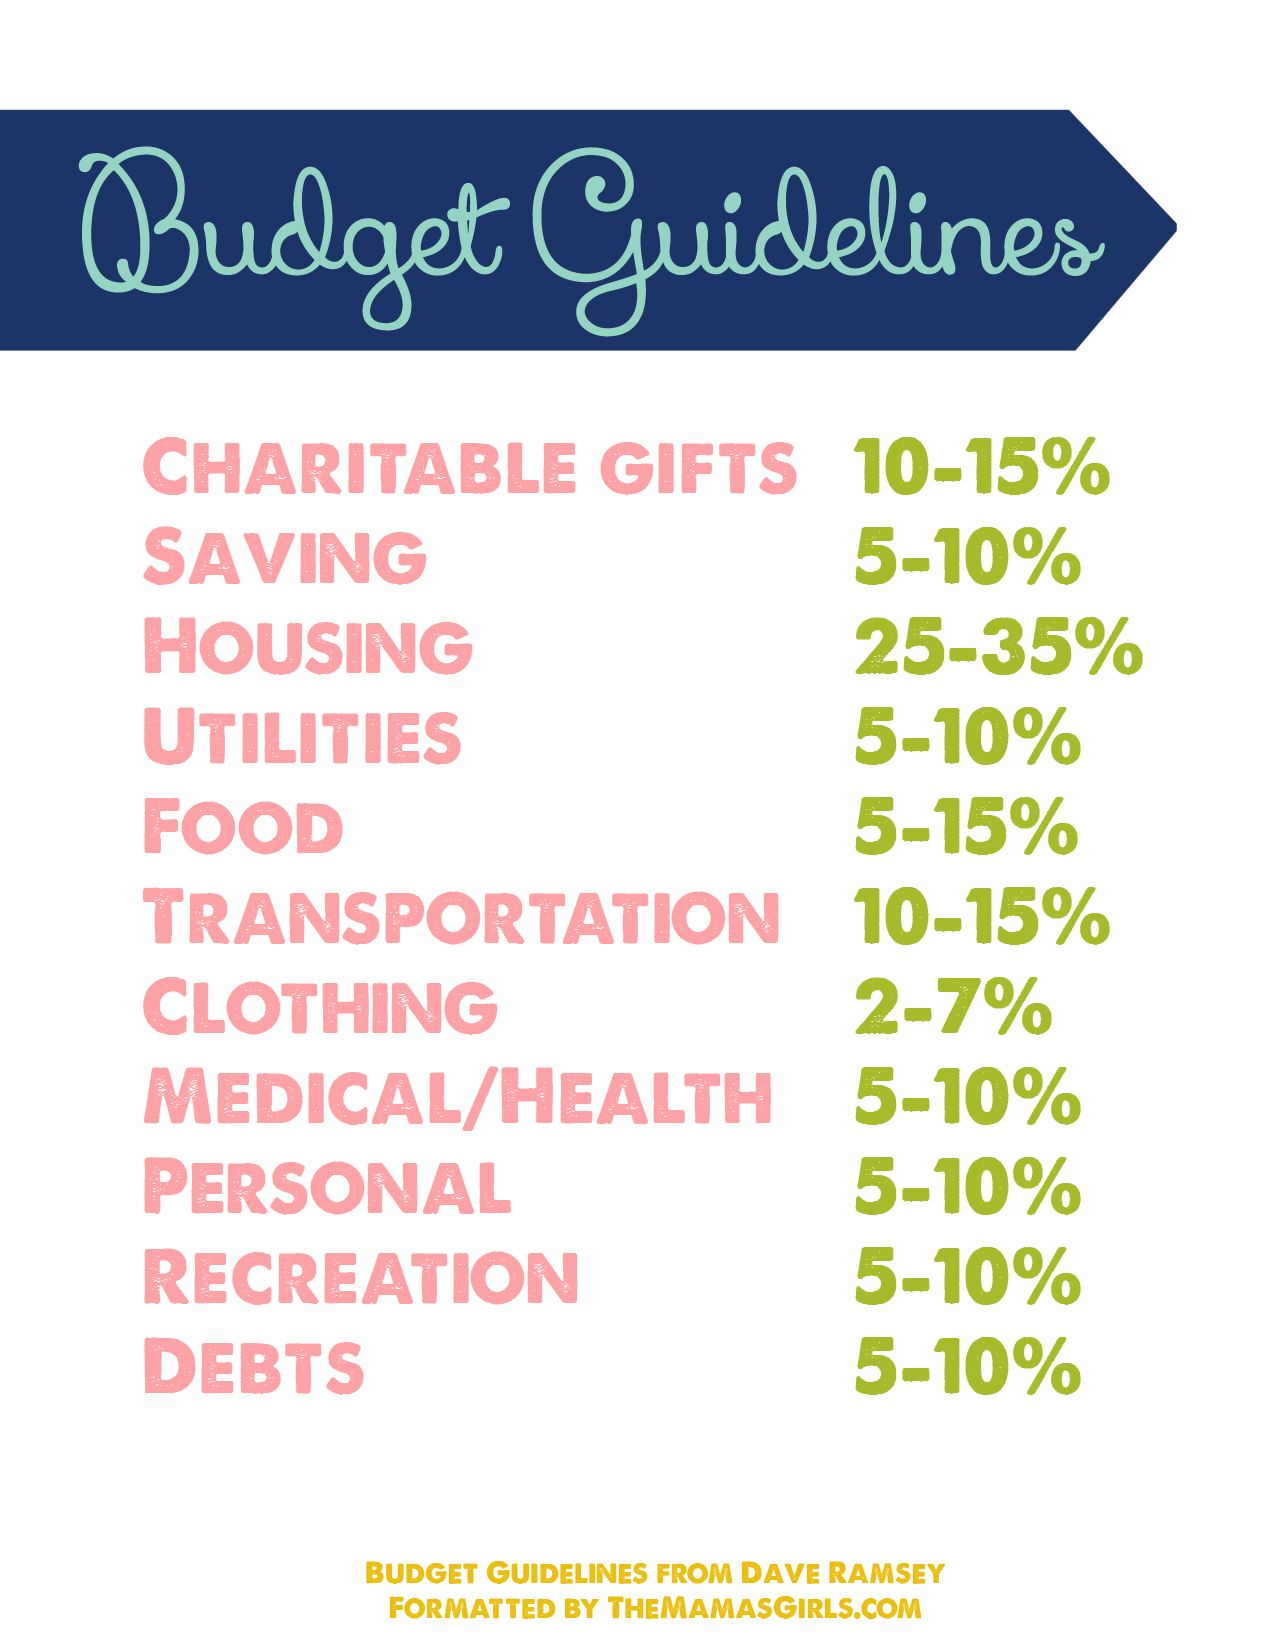 BudgetGuidelines.jpg 1,275×1,650 pixels Budgeting